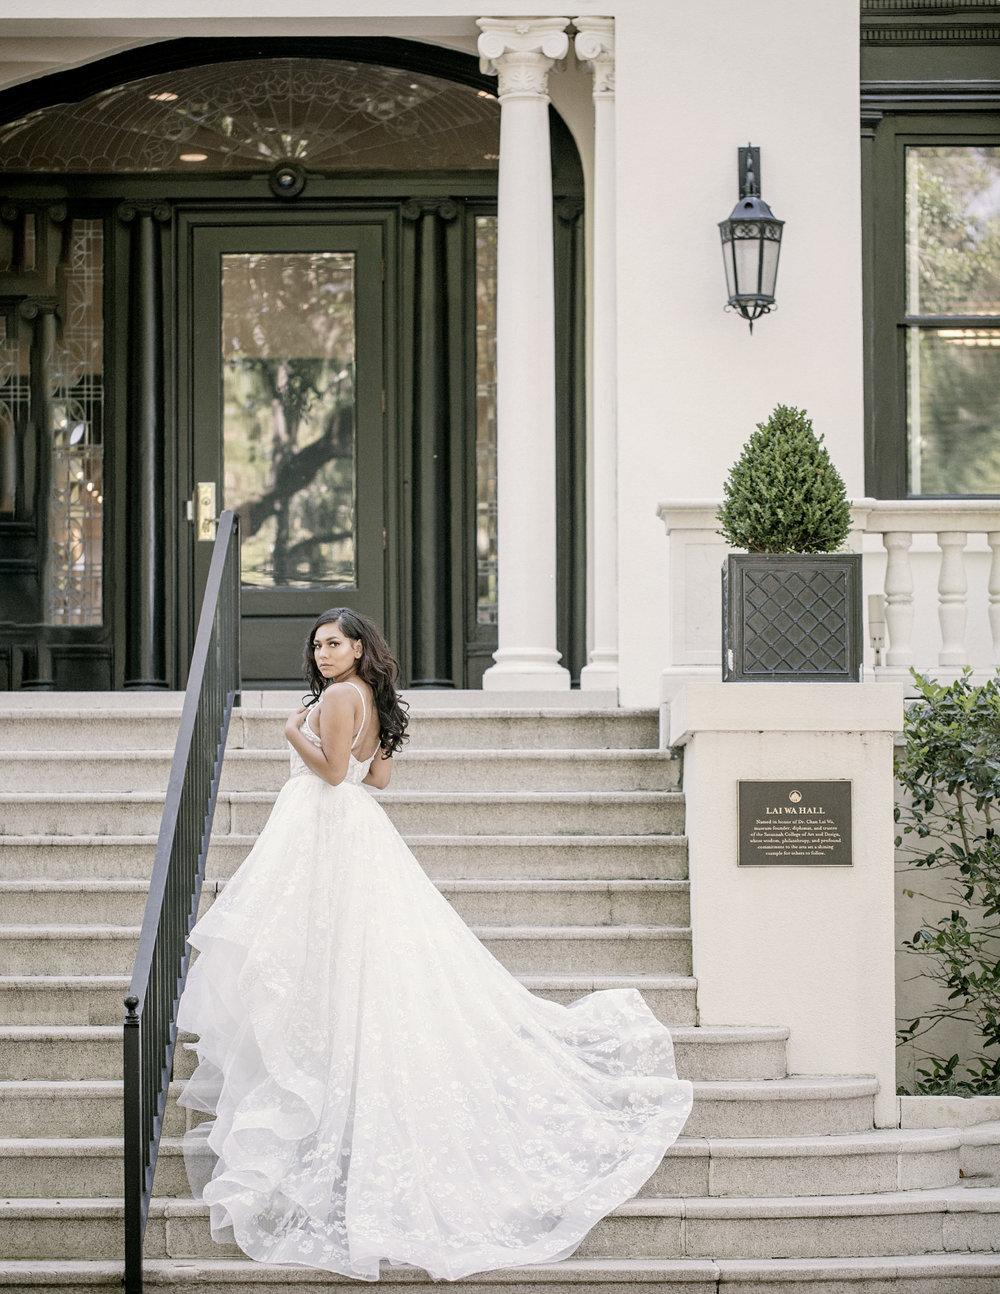 savannah-bridal-shop-unexpected-joys-of-wedding-planning-savannah-wedding-planning-gina-vogel-photography-savannah-weddings-8.jpg